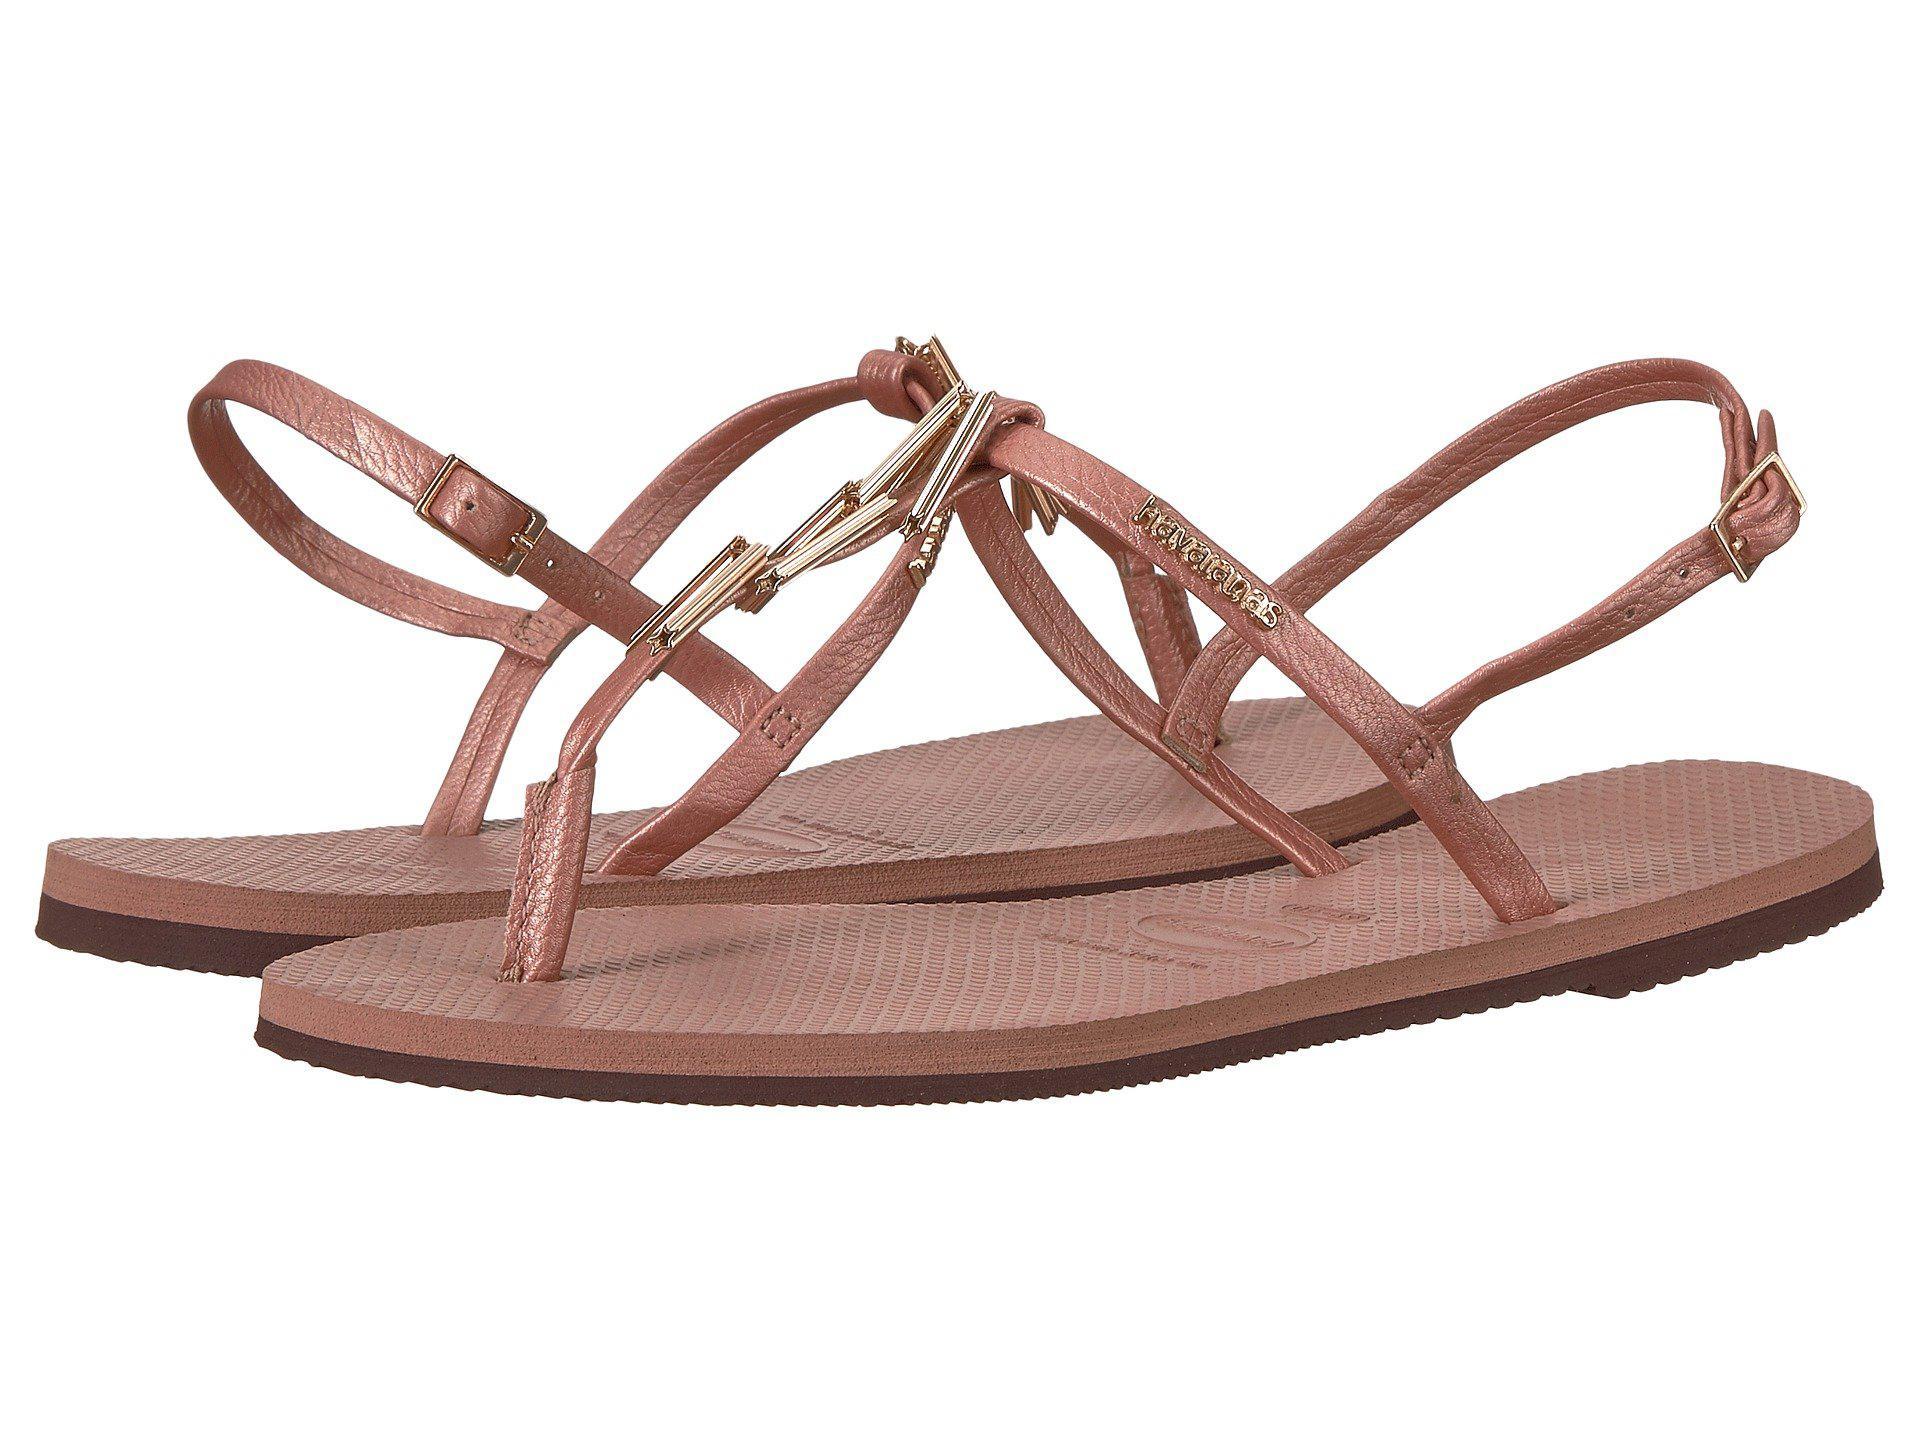 4f3e99cc36ed3 Lyst - Havaianas You Riviera Maxi Sandals - Save 29%